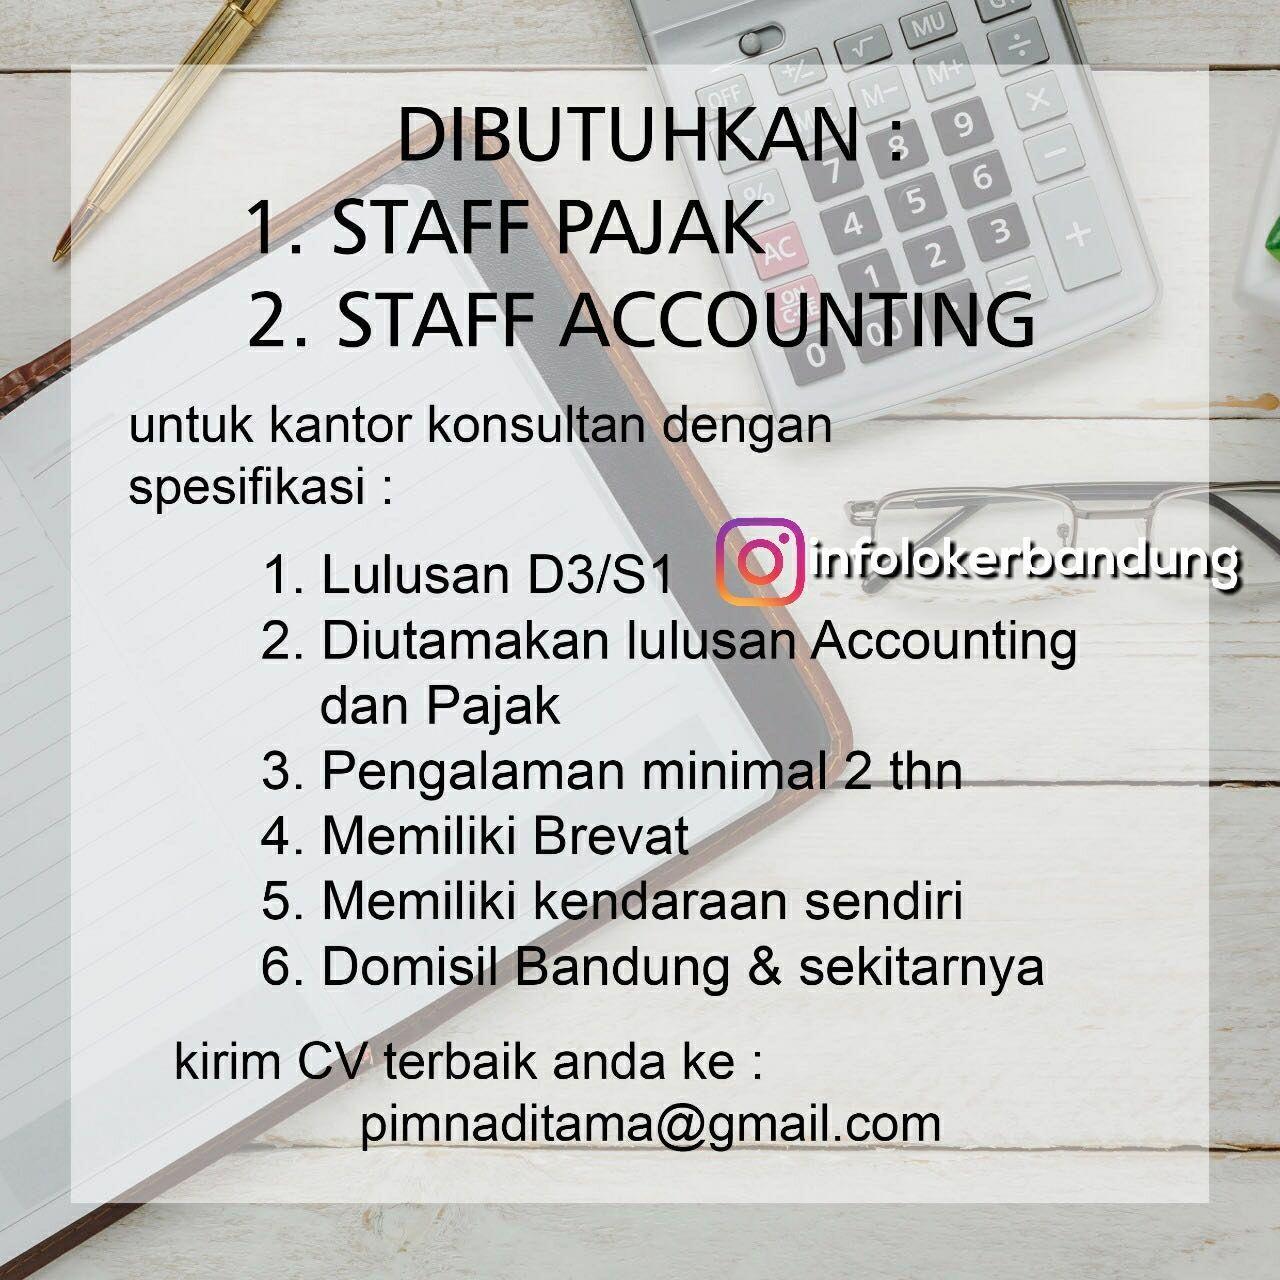 Lowongan kerja staff pajak staff accounting bandung februari 2018 lowongan kerja staff pajak staff accounting bandung februari 2018 junglespirit Image collections